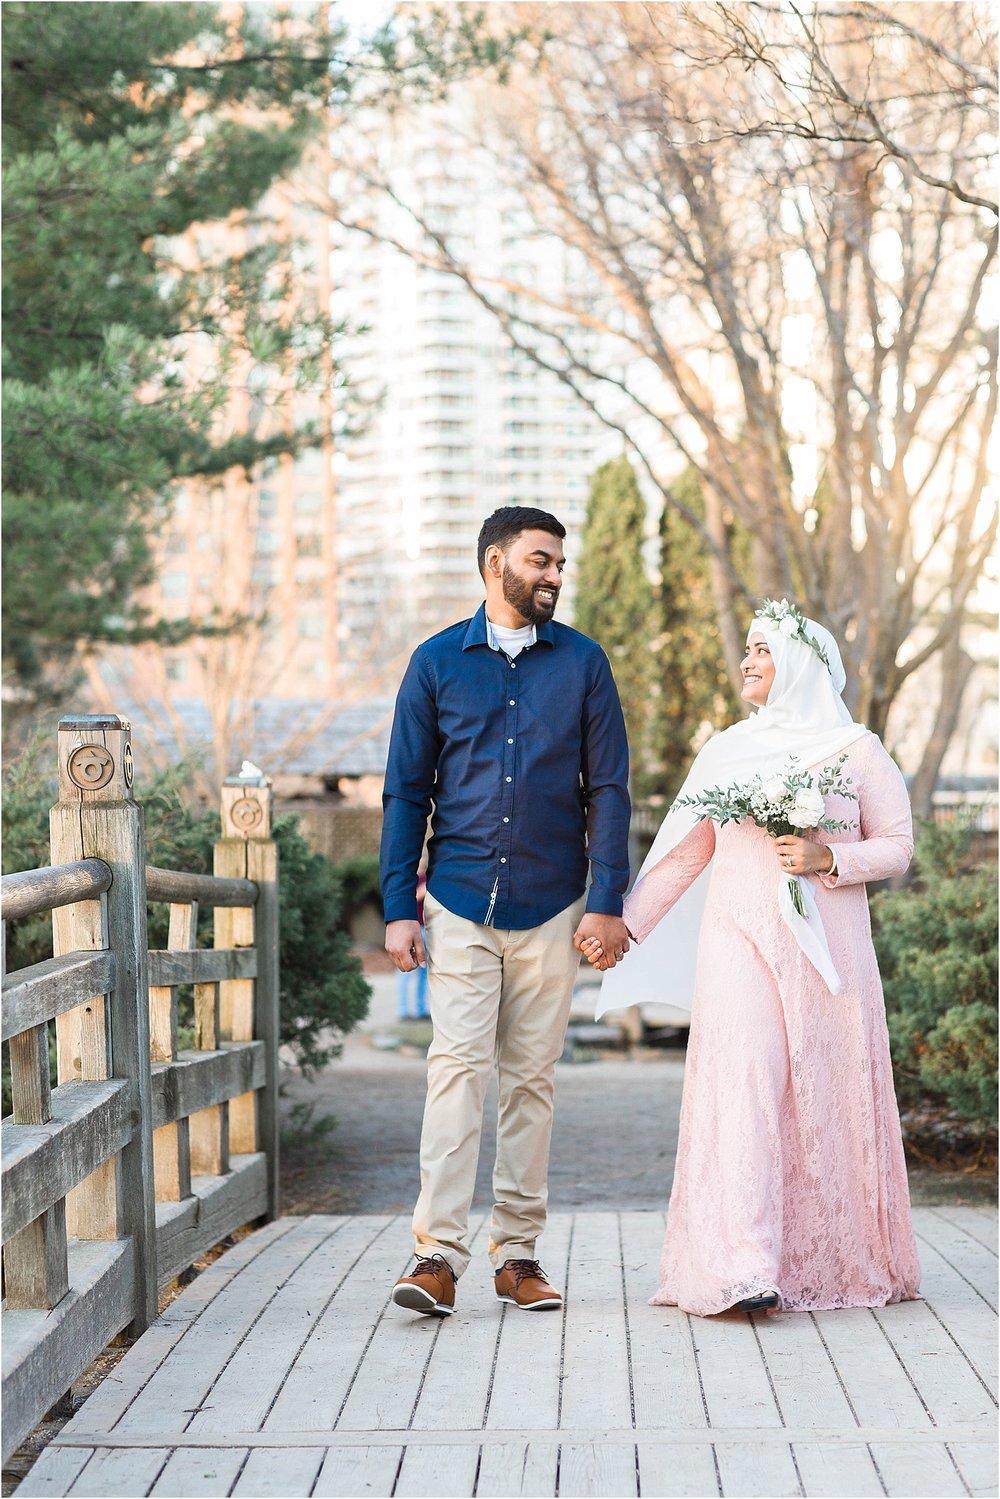 Kariya-Park-Anniversary-Session-Toronto-Mississauga-Brampton-Scarborough-GTA-Pakistani-Indian-Wedding-Engagement-Photographer-Photography_0027.jpg